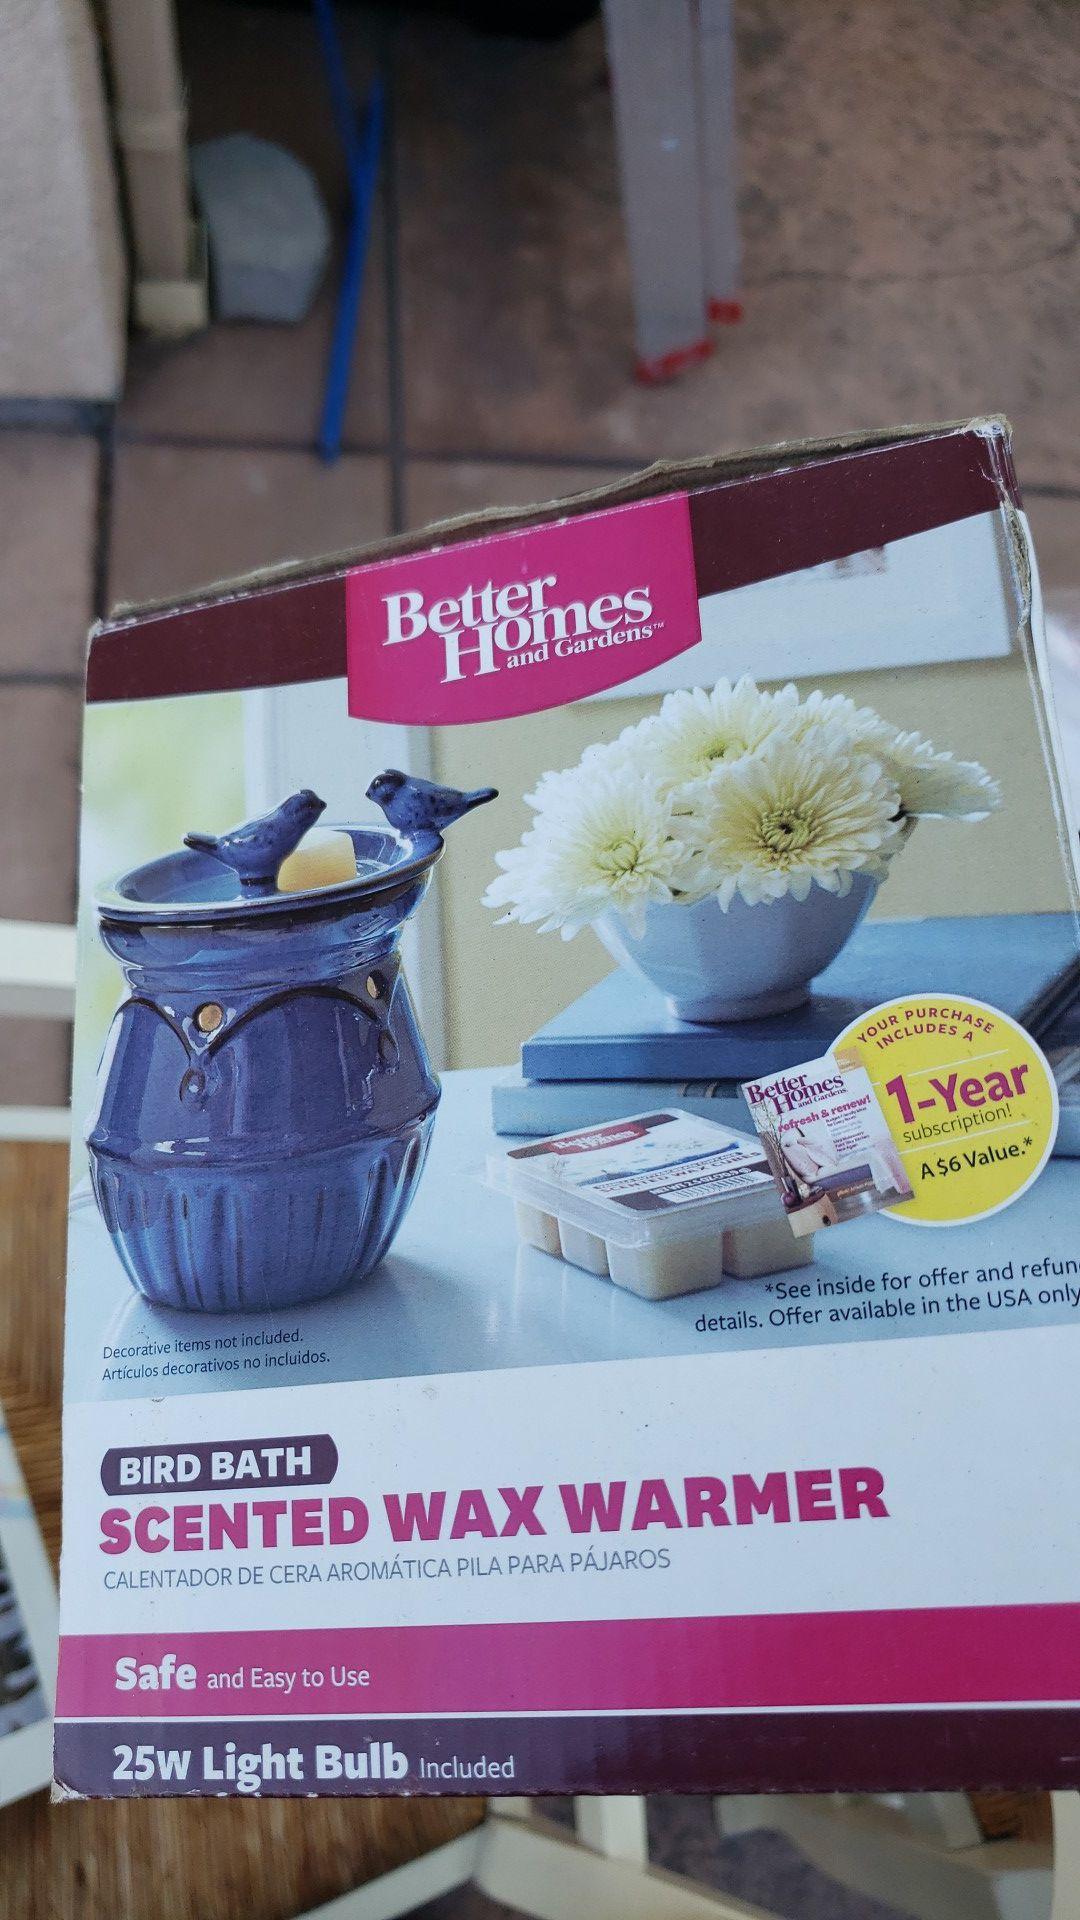 Bird bath wax warmer